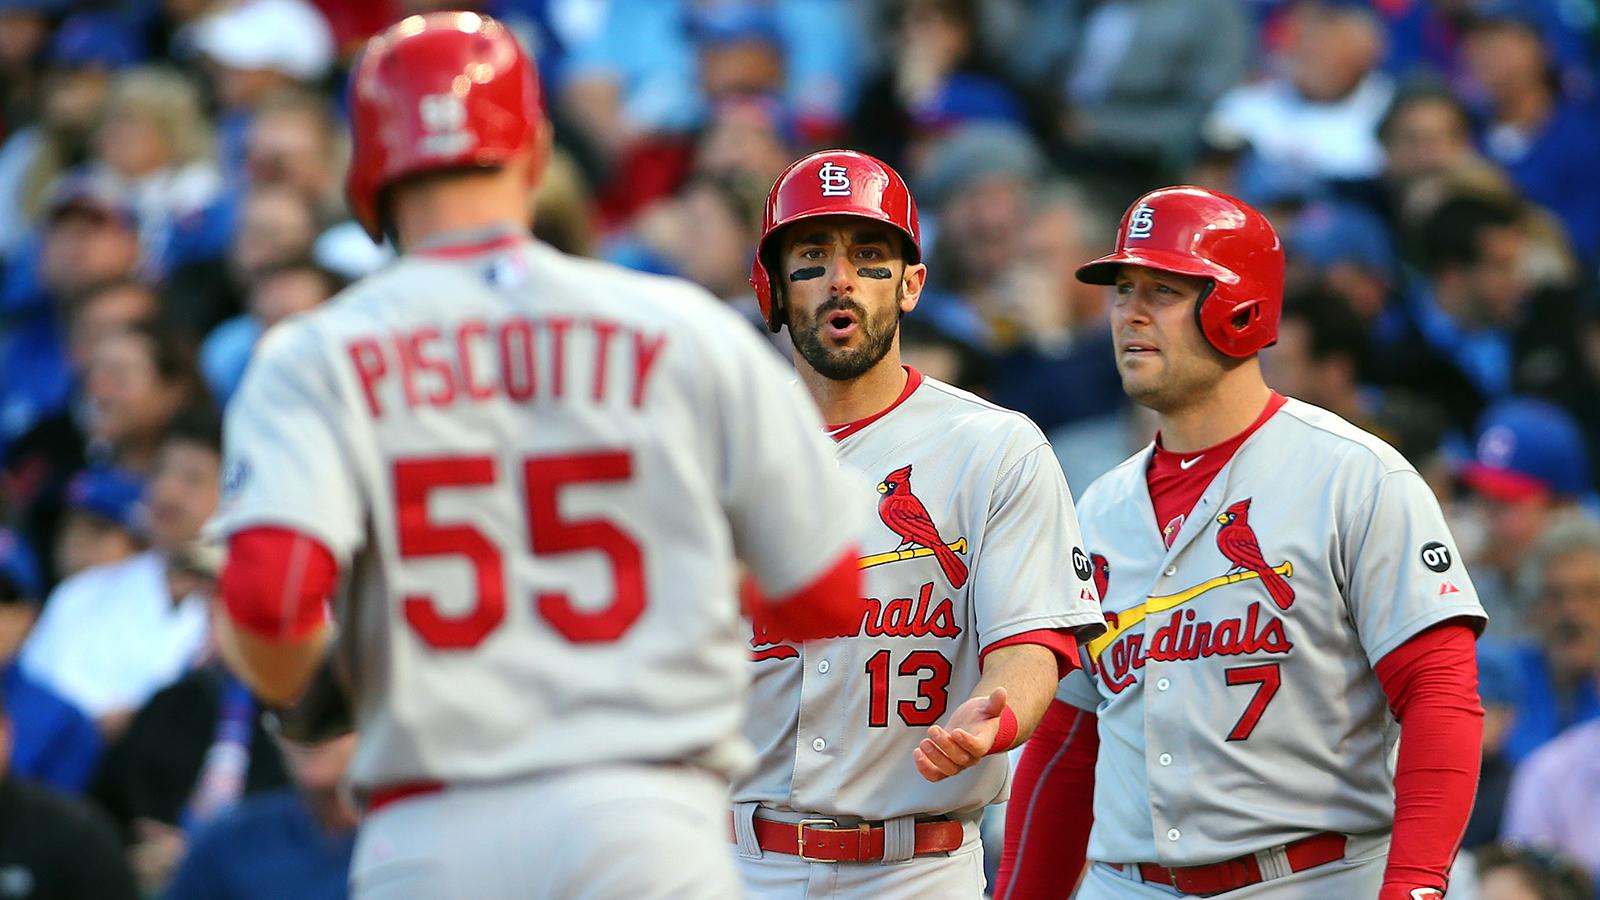 012116-MLB-Cardinals-Lineup-PI